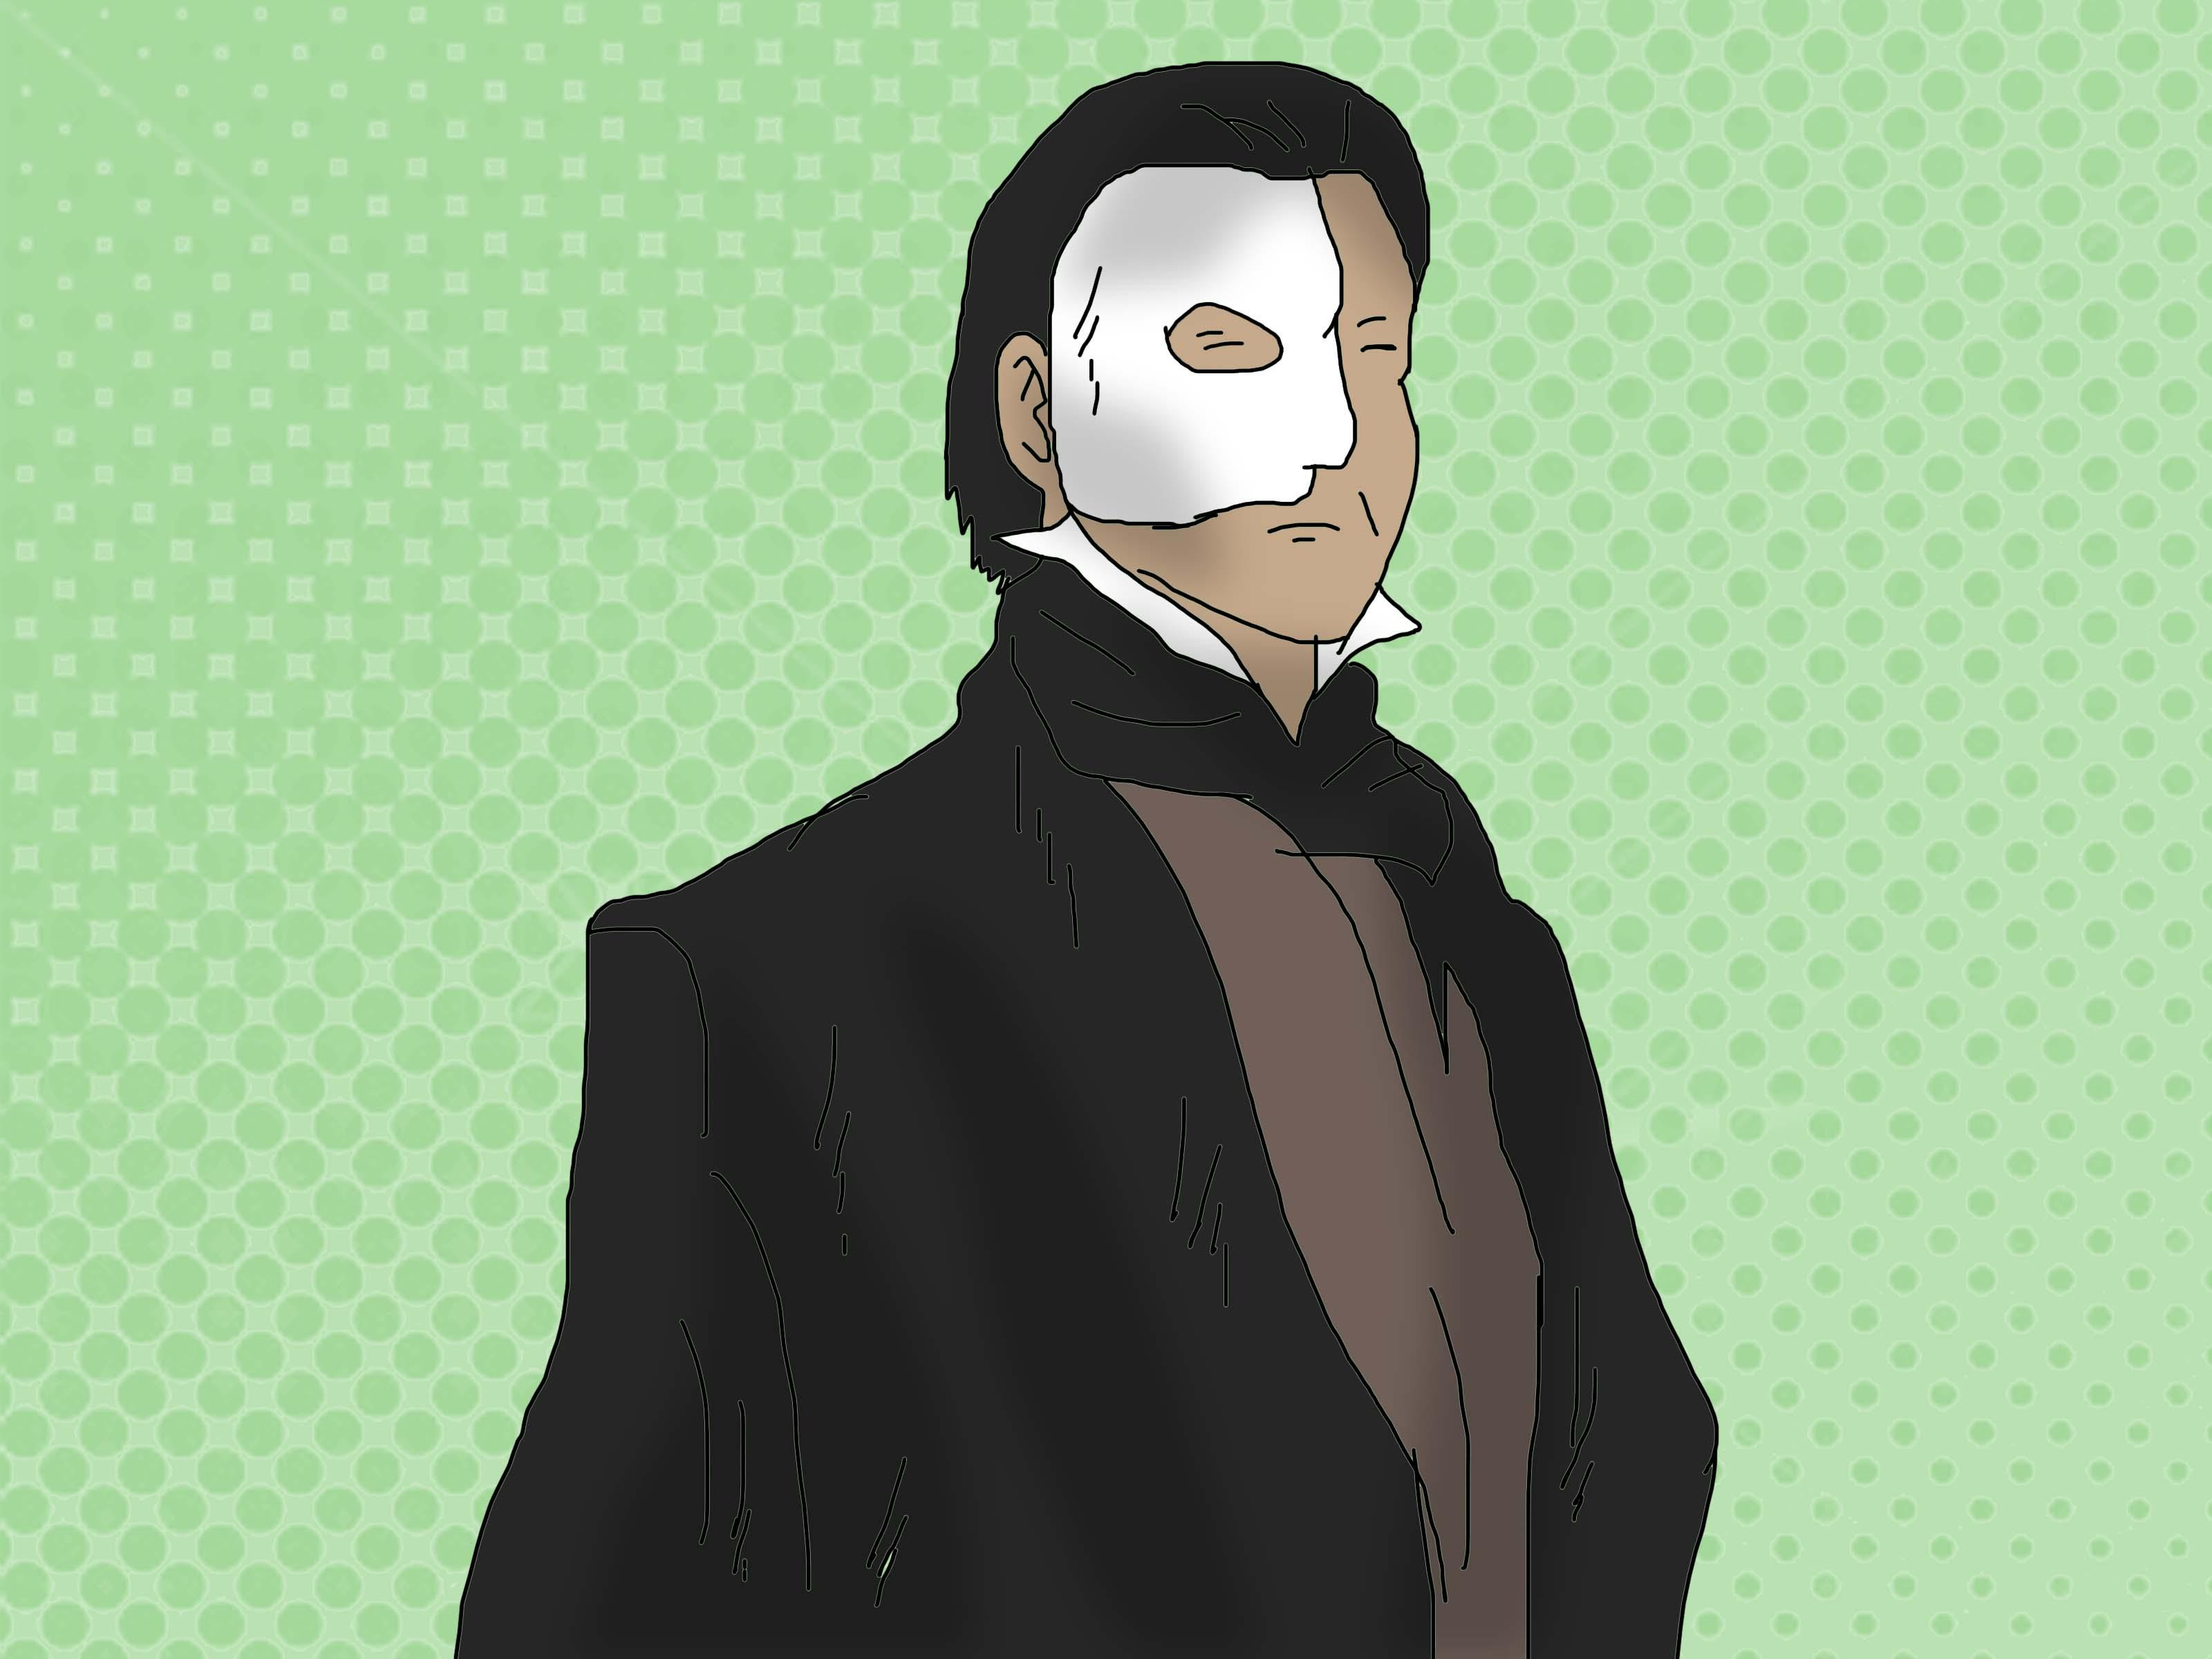 phantom of the opera characters